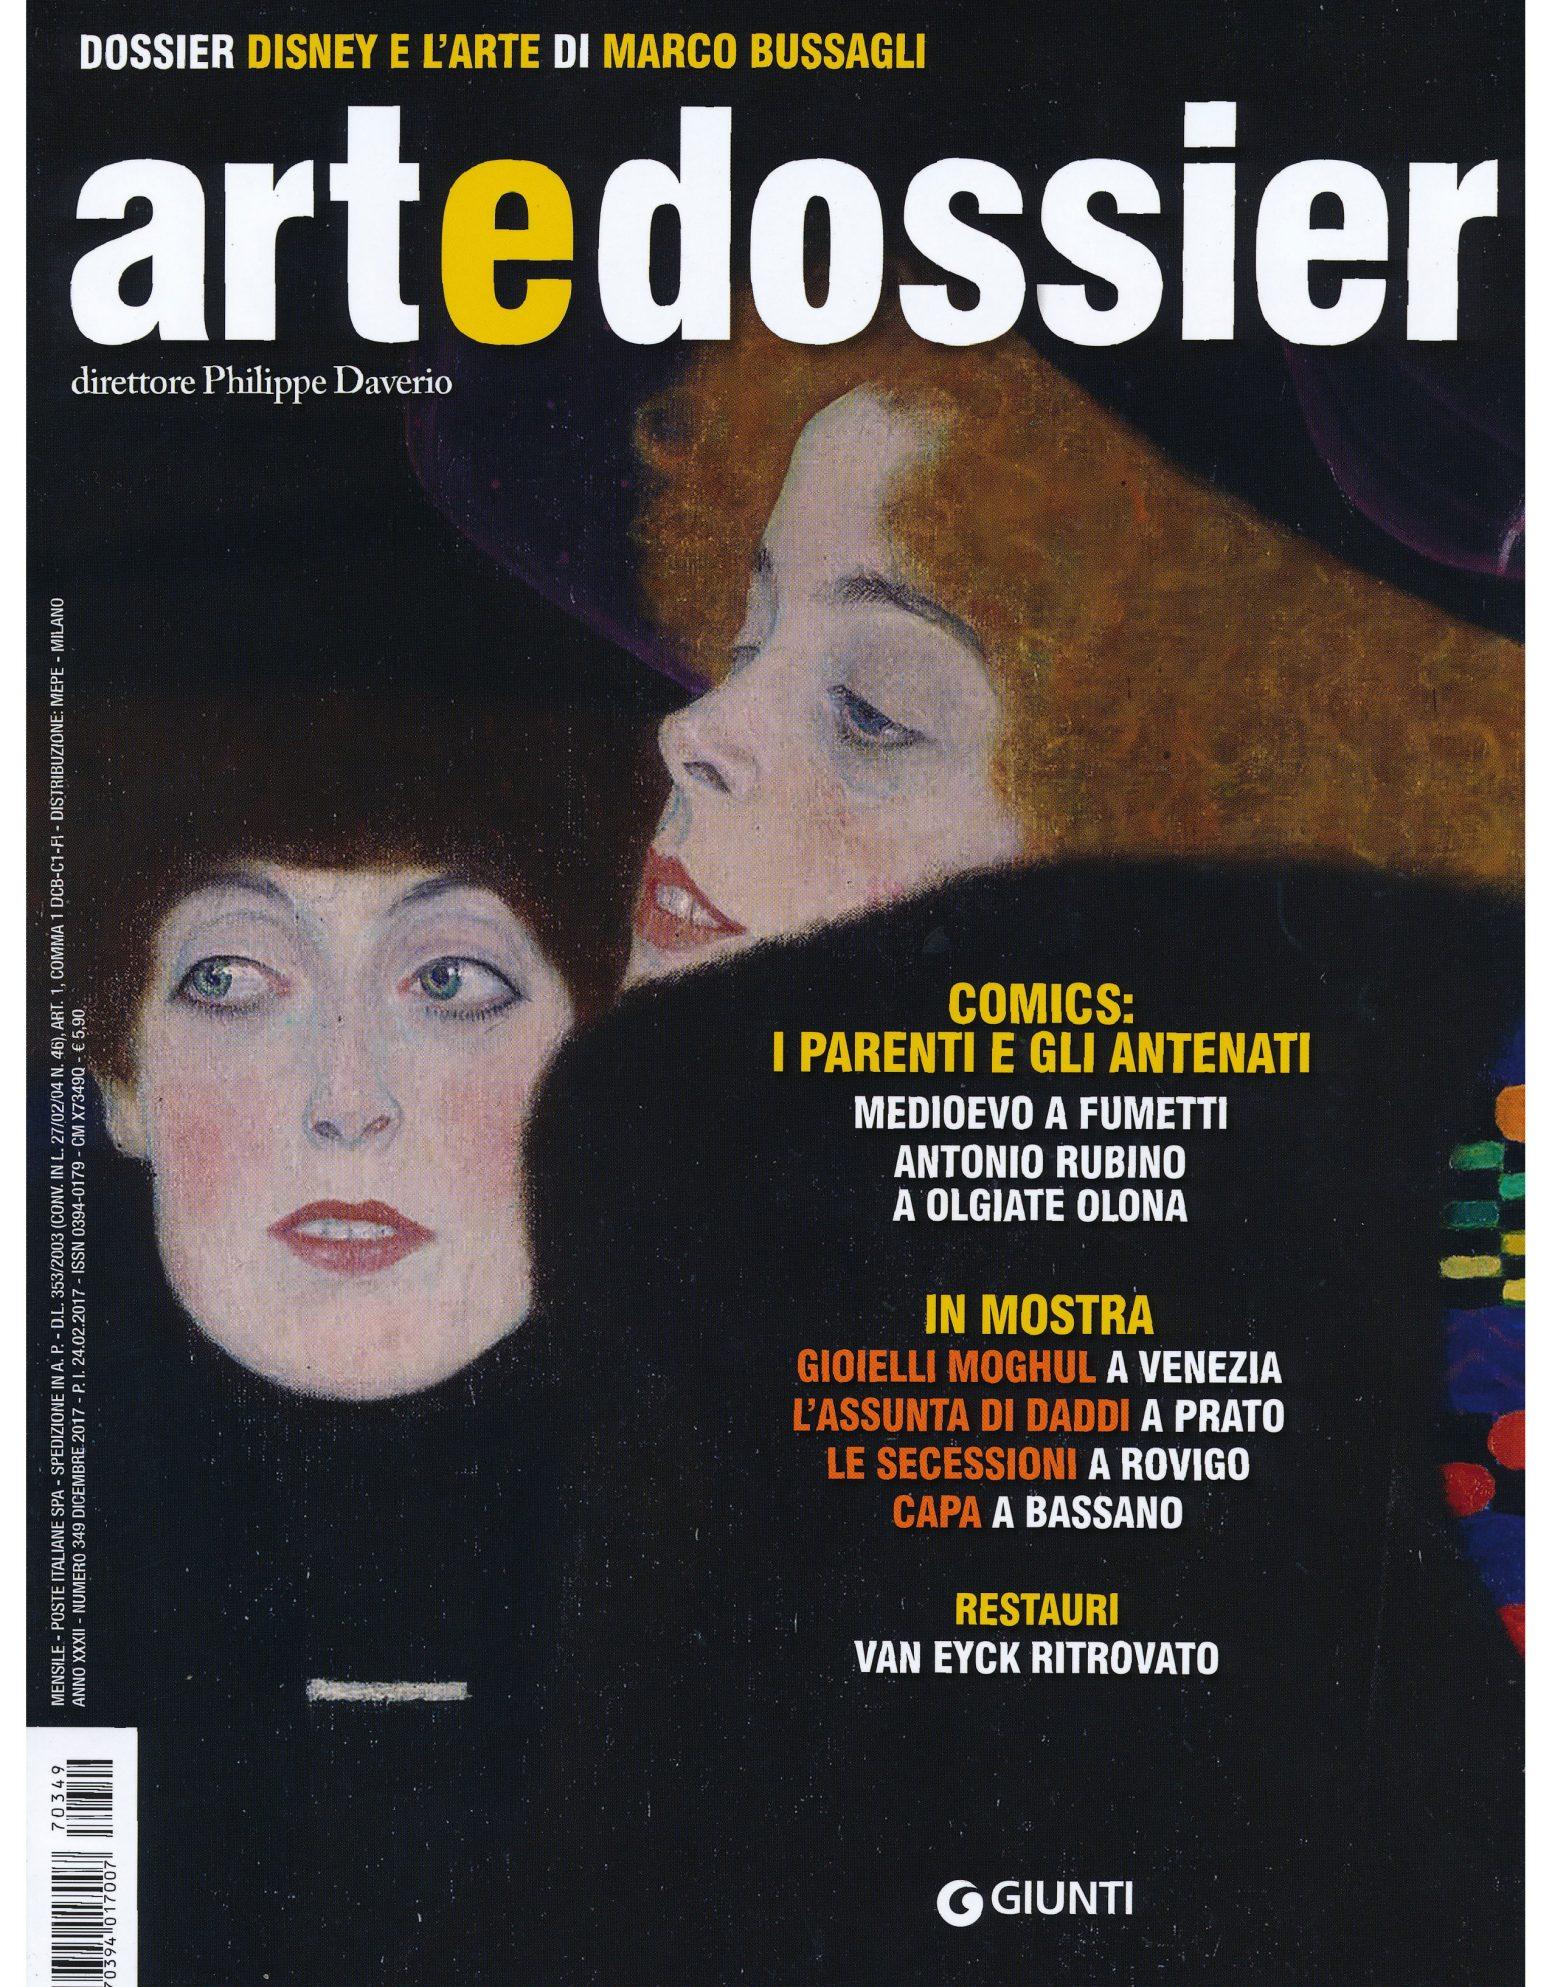 ARTEDOSSIER, no.349